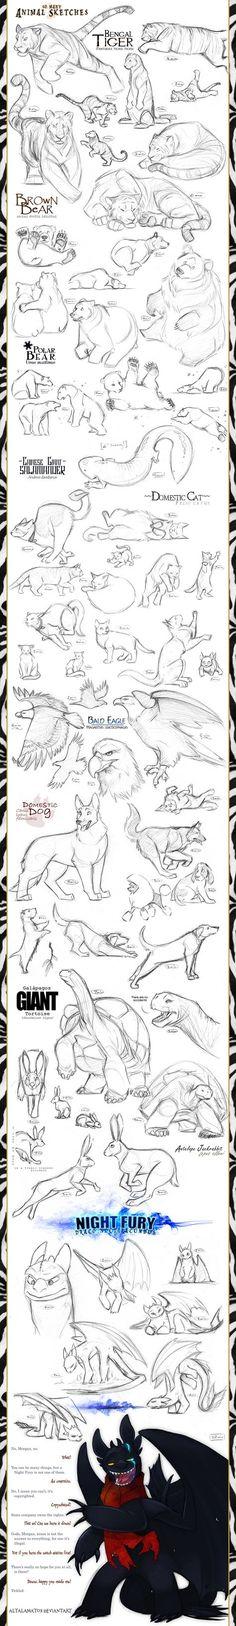 Animal Sketches by Altalamatox.deviantart.com on @deviantART || CHARACTER DESIGN REFERENCES | Find more at